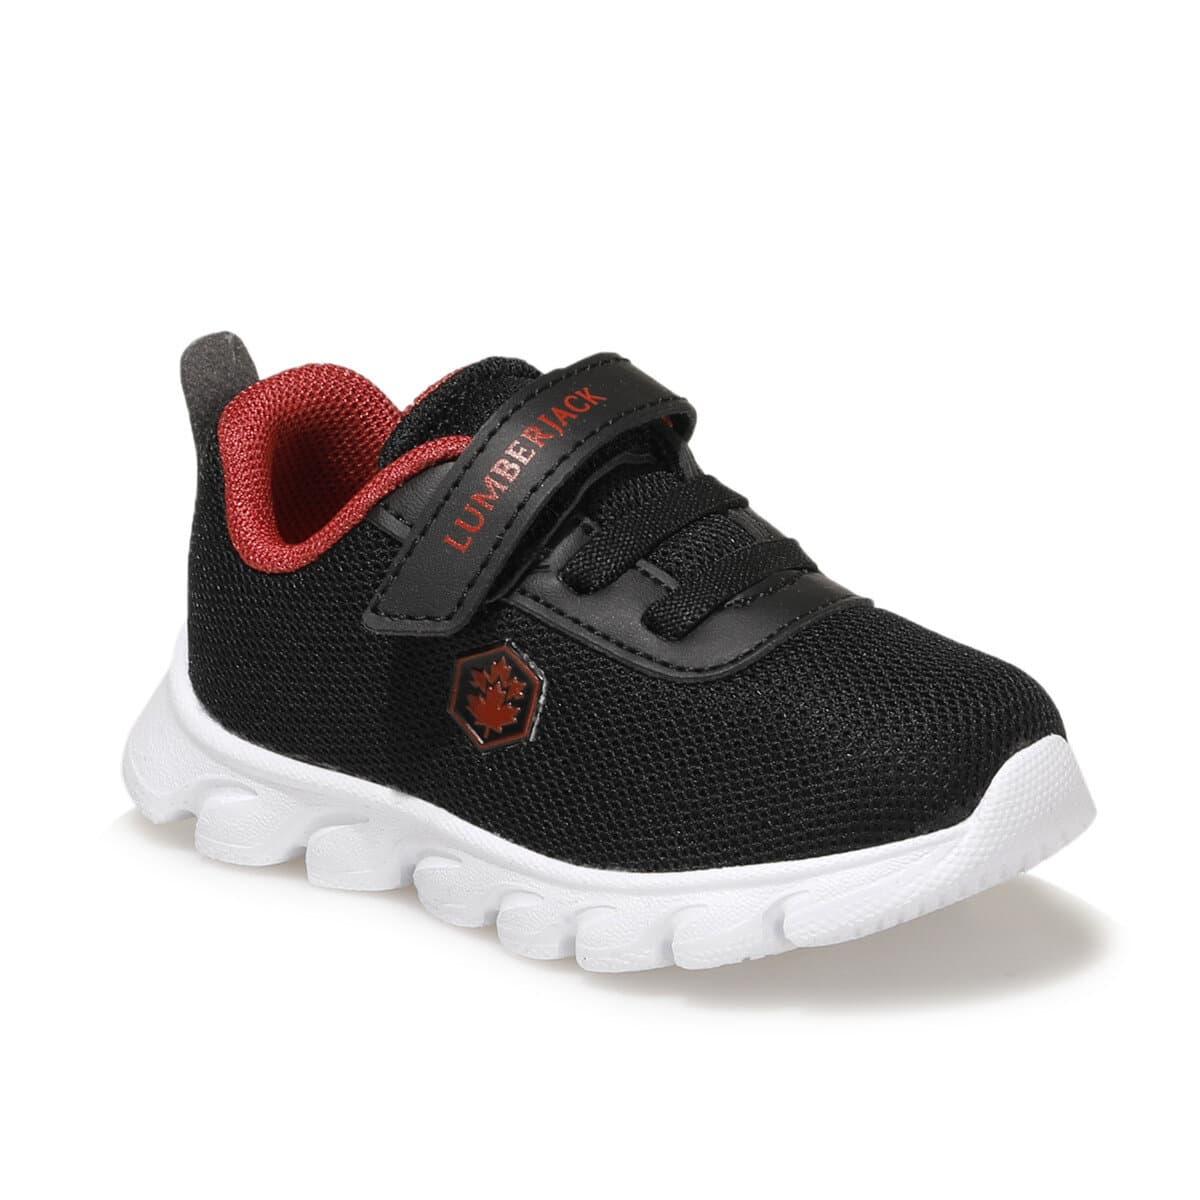 First Çocuk Siyah Koşu Ayakkabısı (100784956)